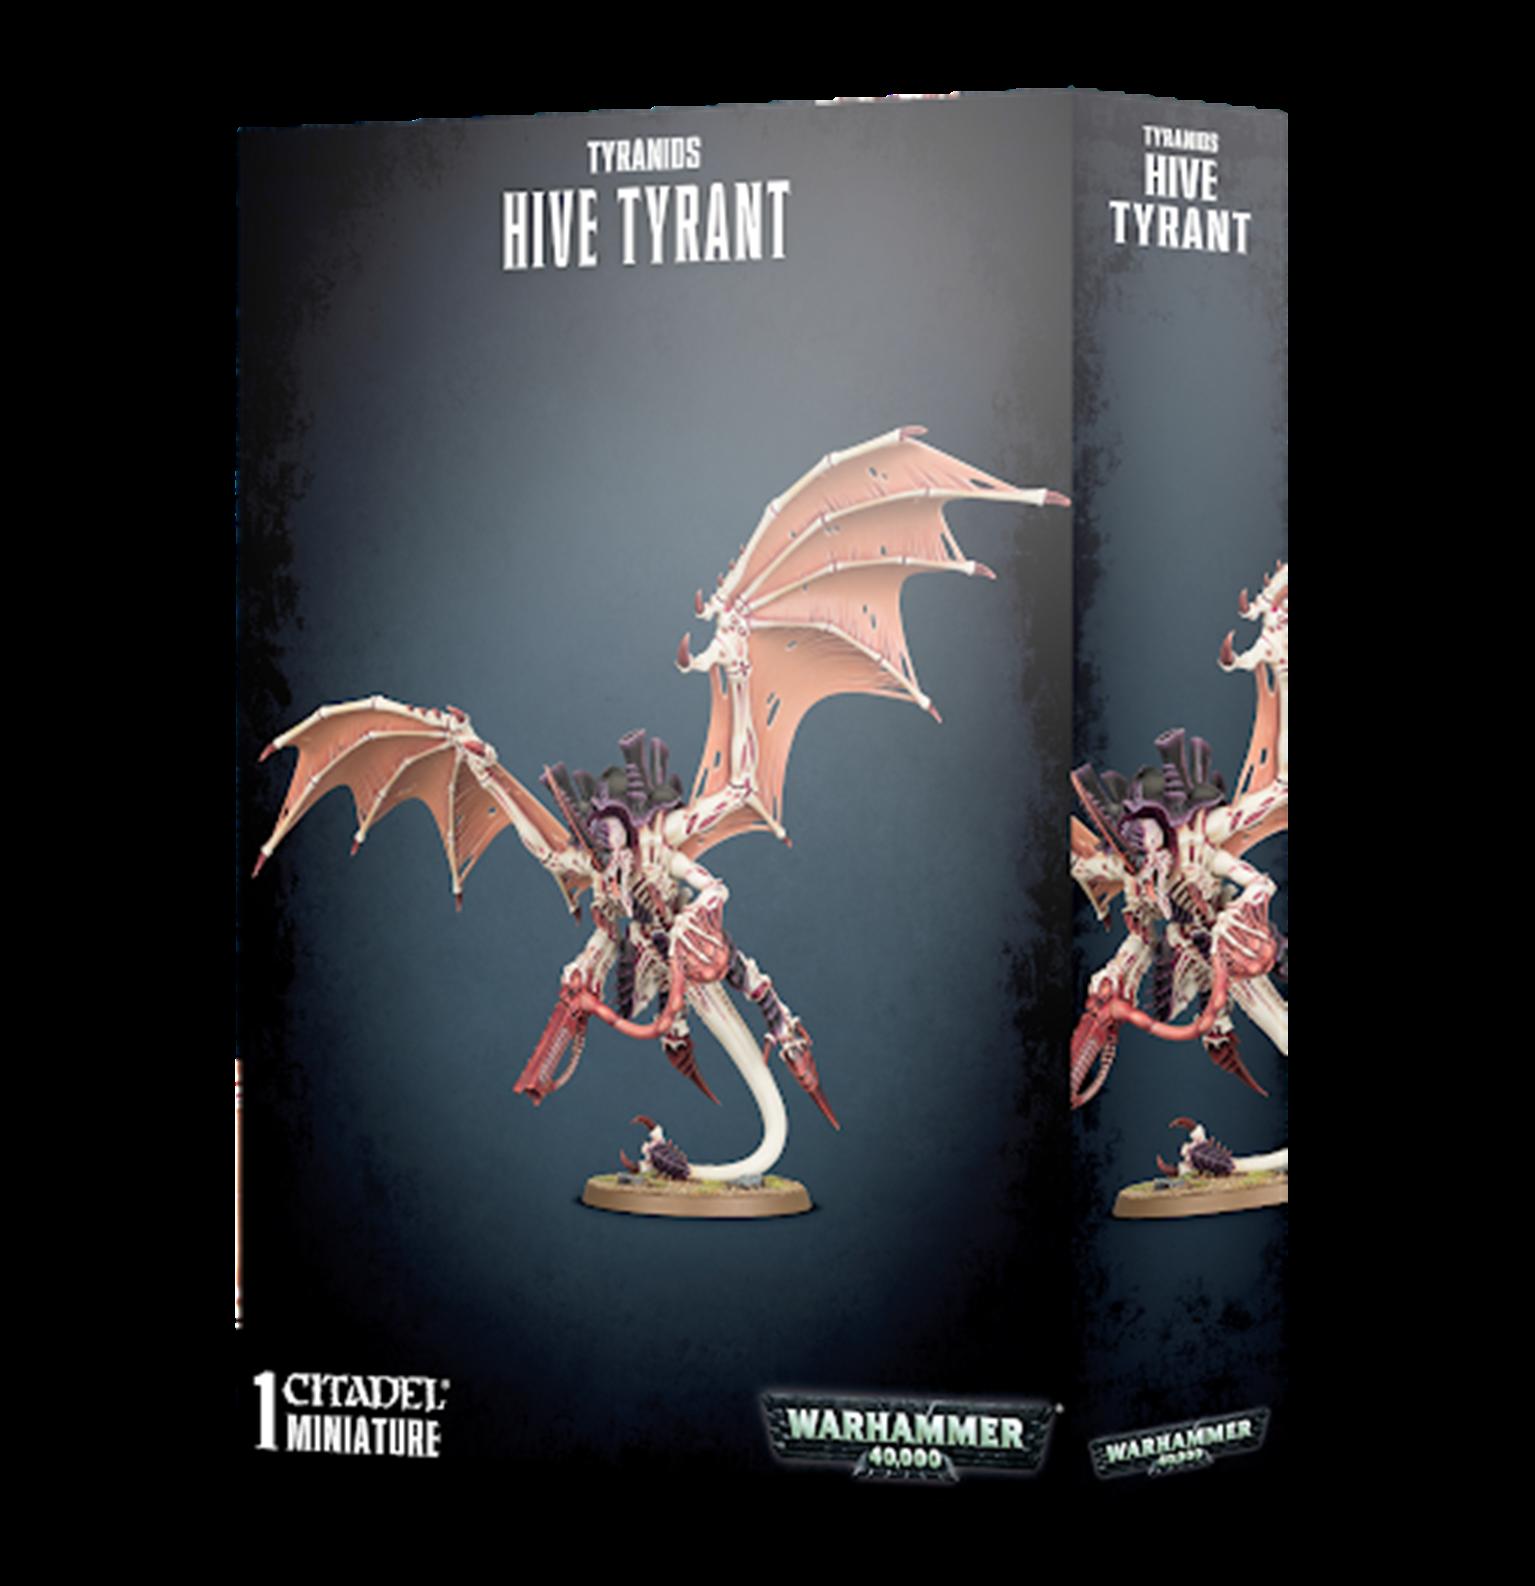 Warhammer 40,000 Tyranids Hive Tyrant / The Swarmlord